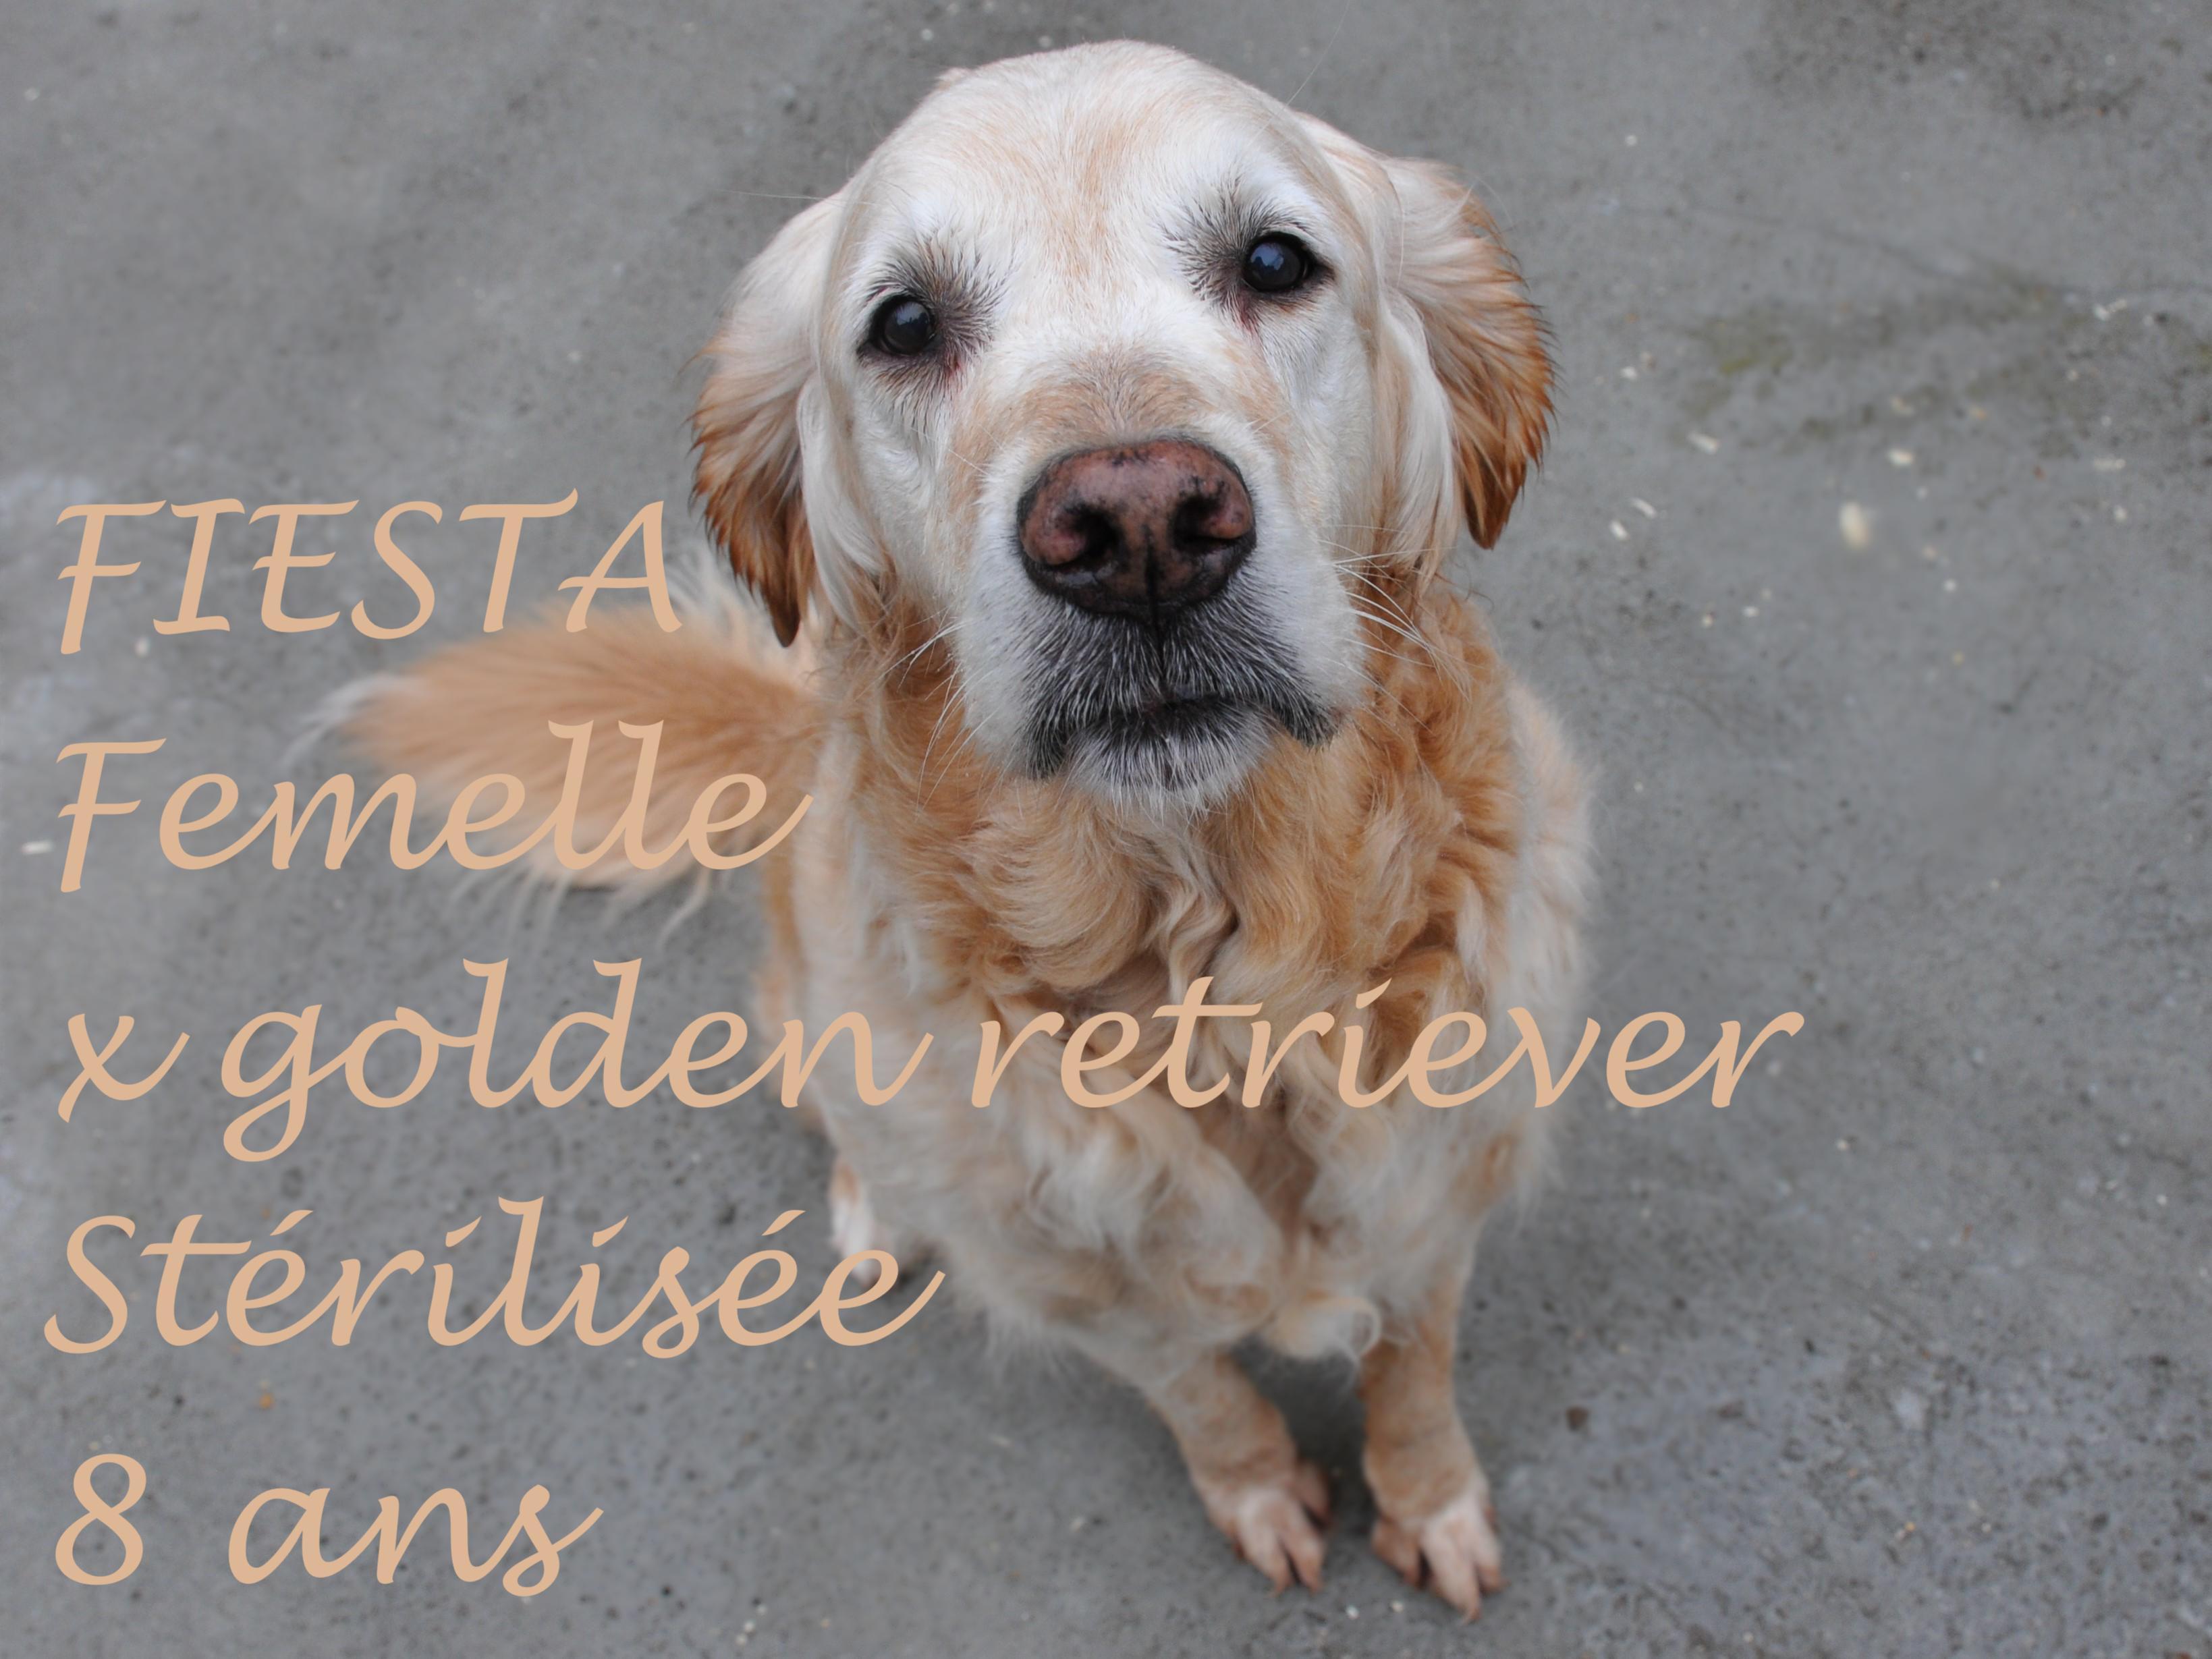 Fiesta_chien golden de laboratoire